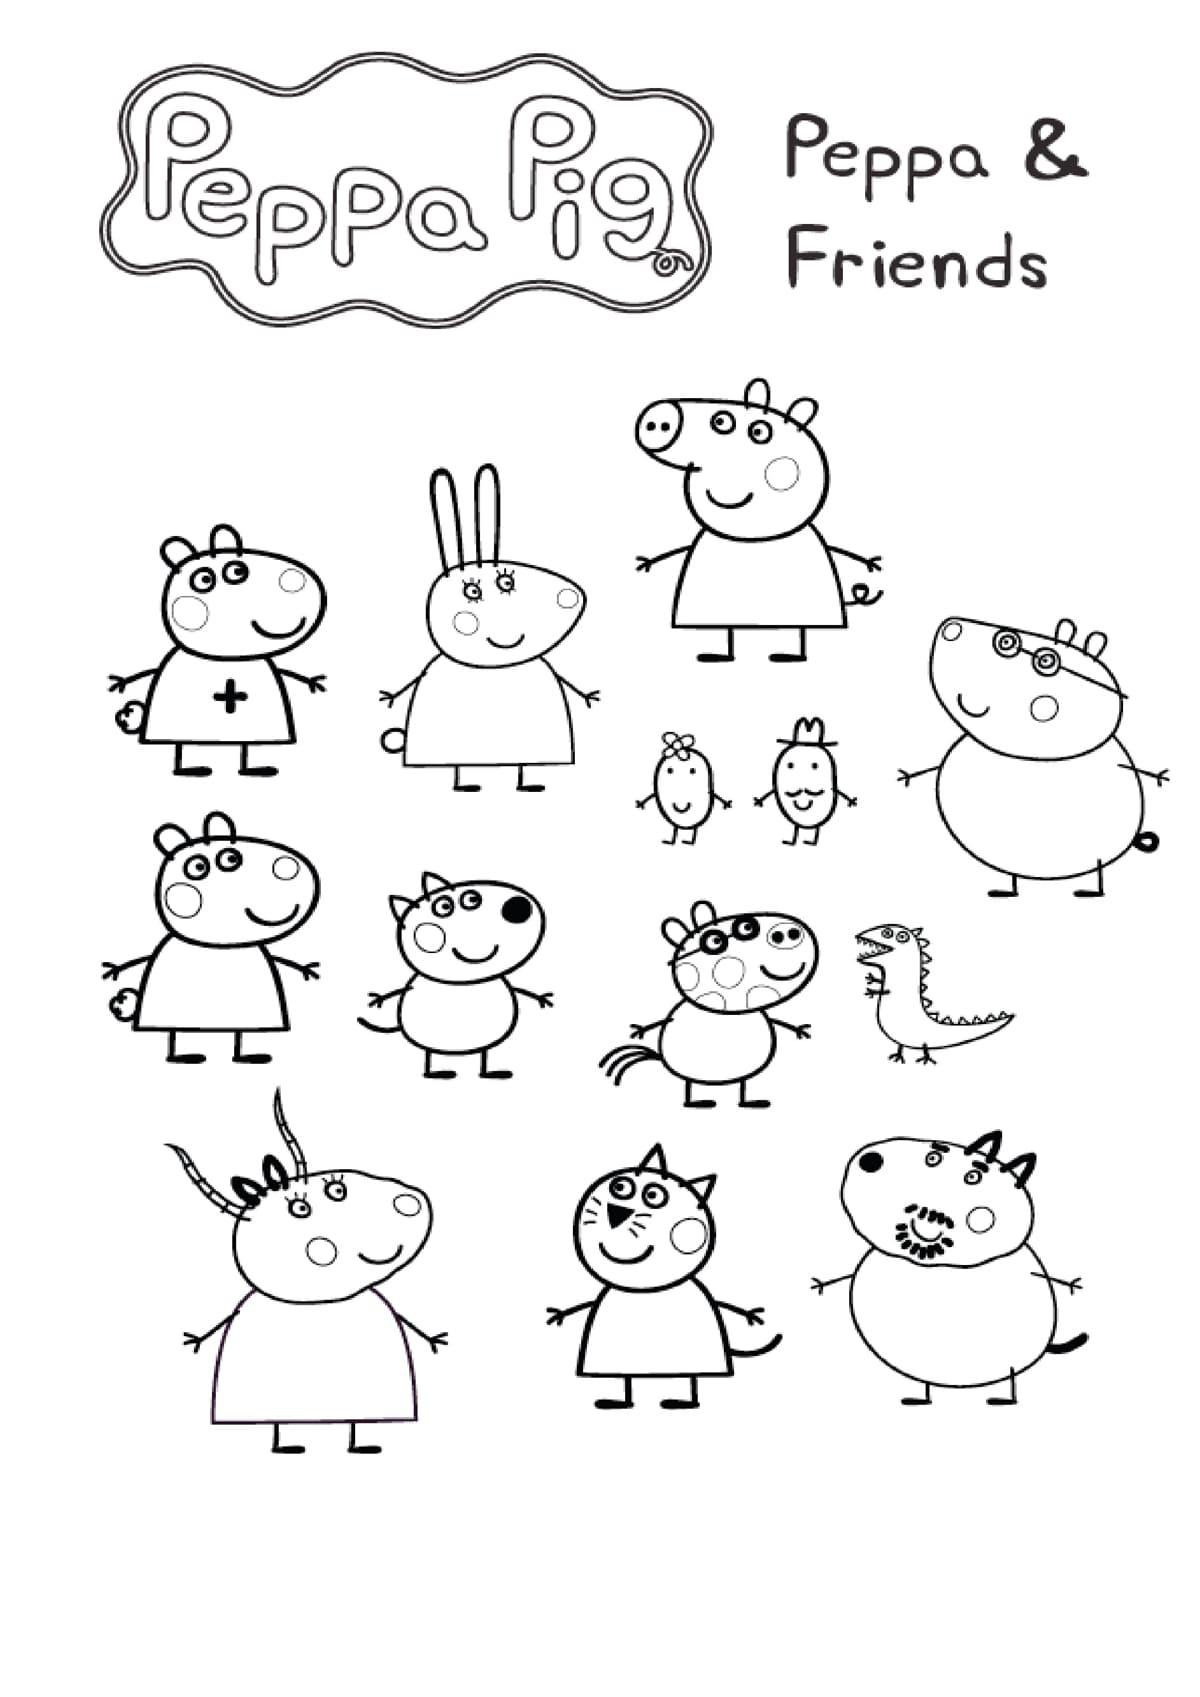 Disegni di Peppa Pig da colorare. Stampa online 90 immagini